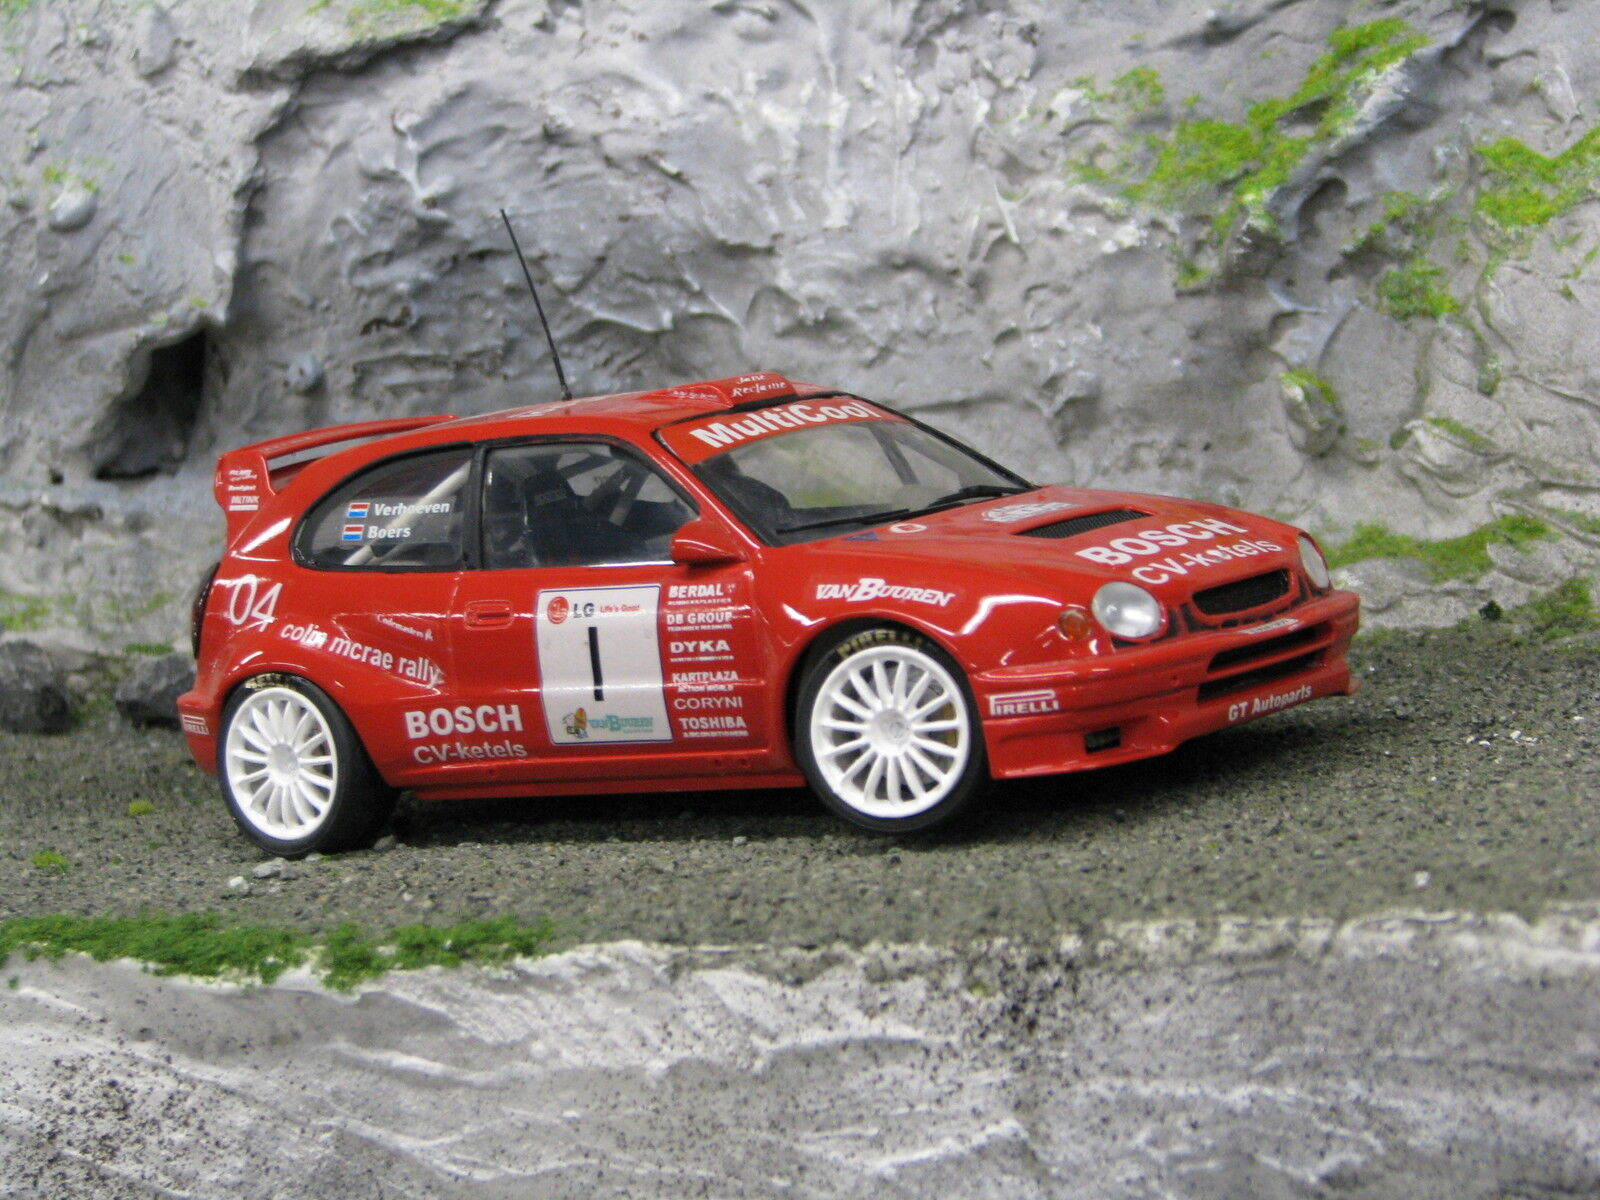 QSP Toyota Corlla WRC 1 24  1 Boers   Verhoeven LG Almere Rally 2004